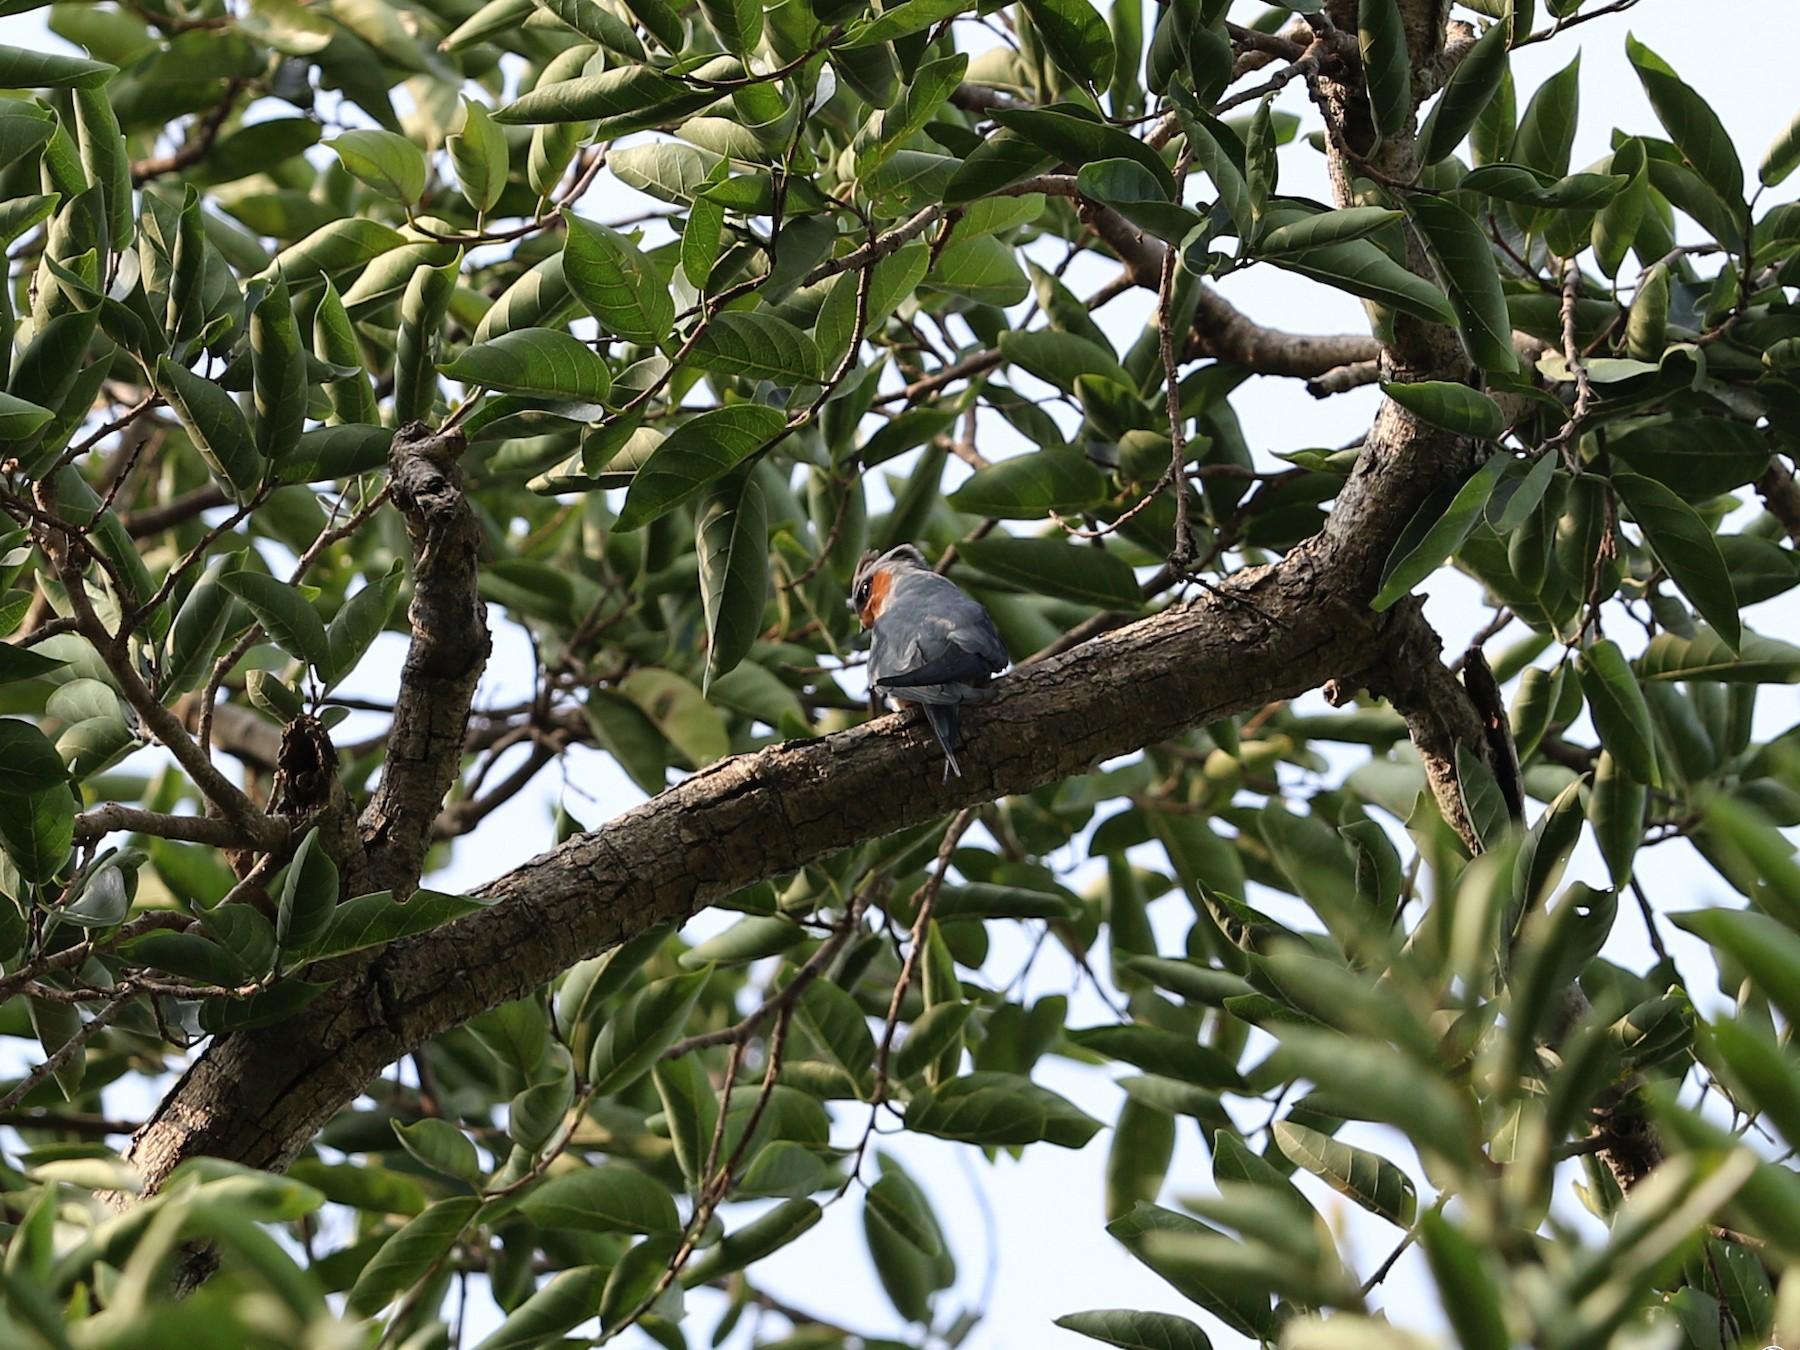 Crested Treeswift - Gaurang Bagda